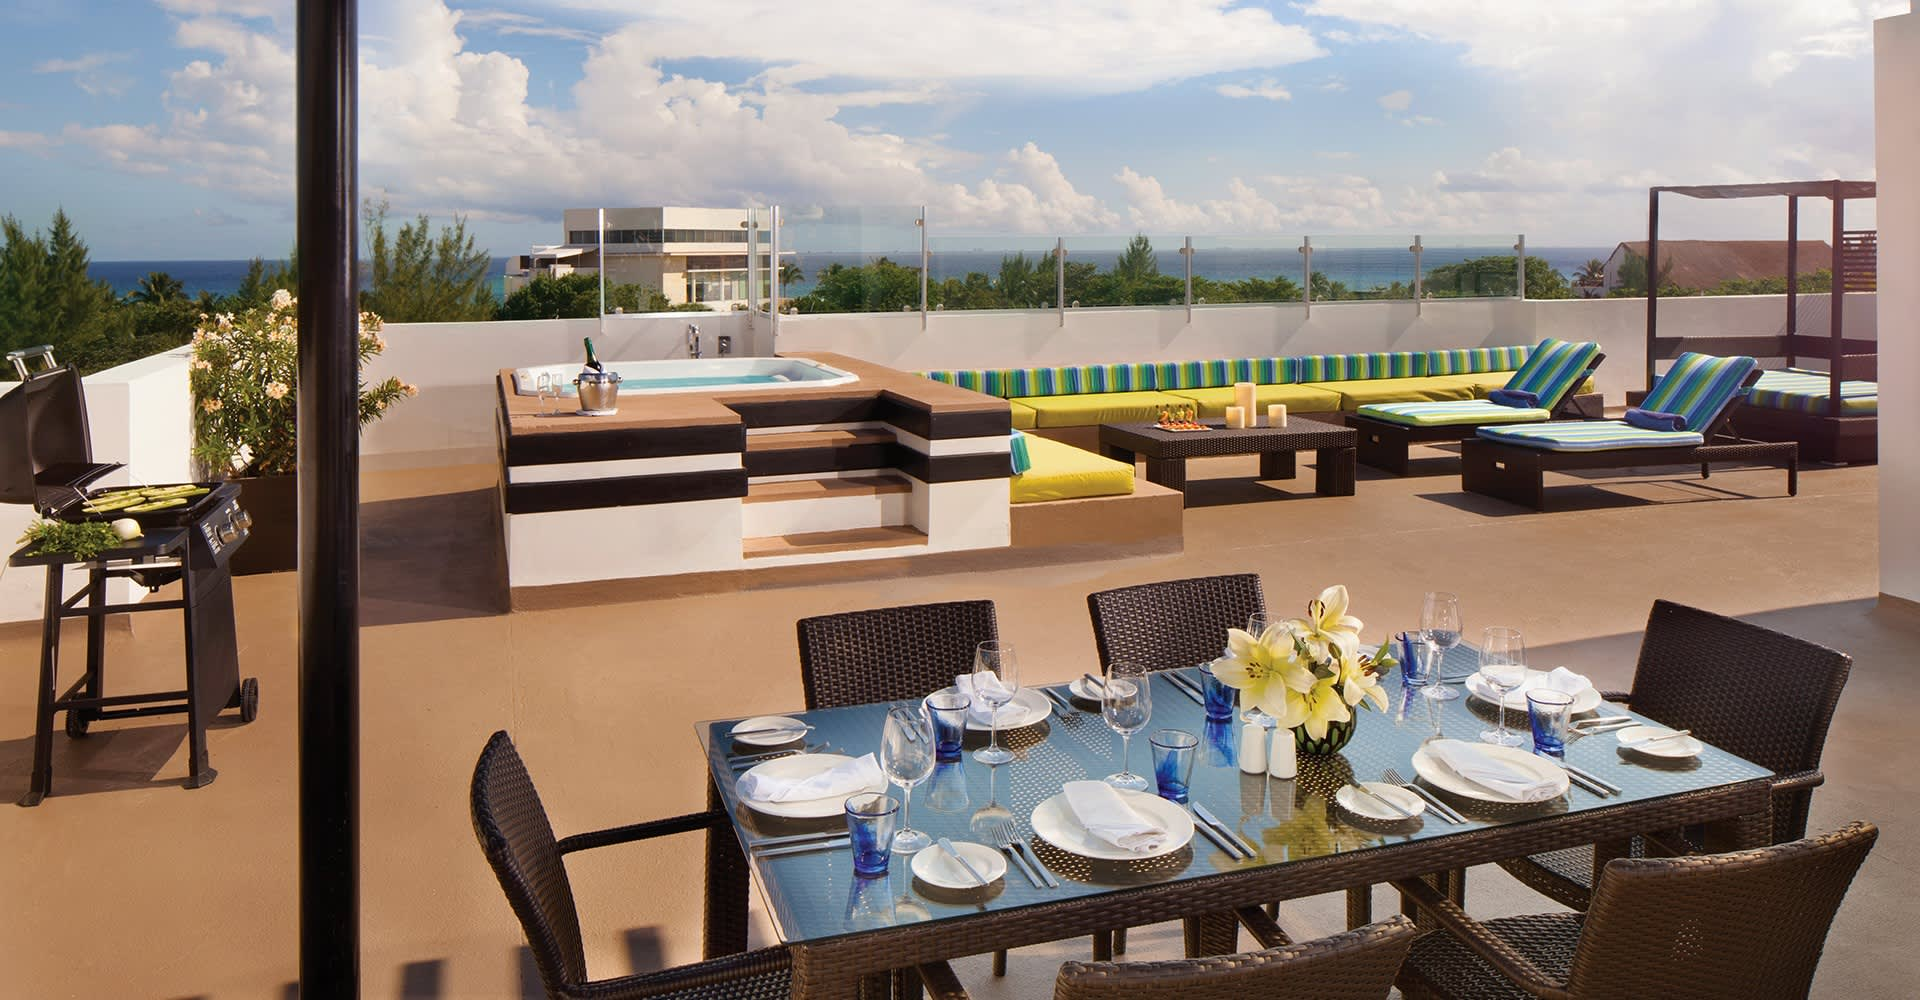 The Fives Beach Hotel, Playa del Carmen dining Facilities